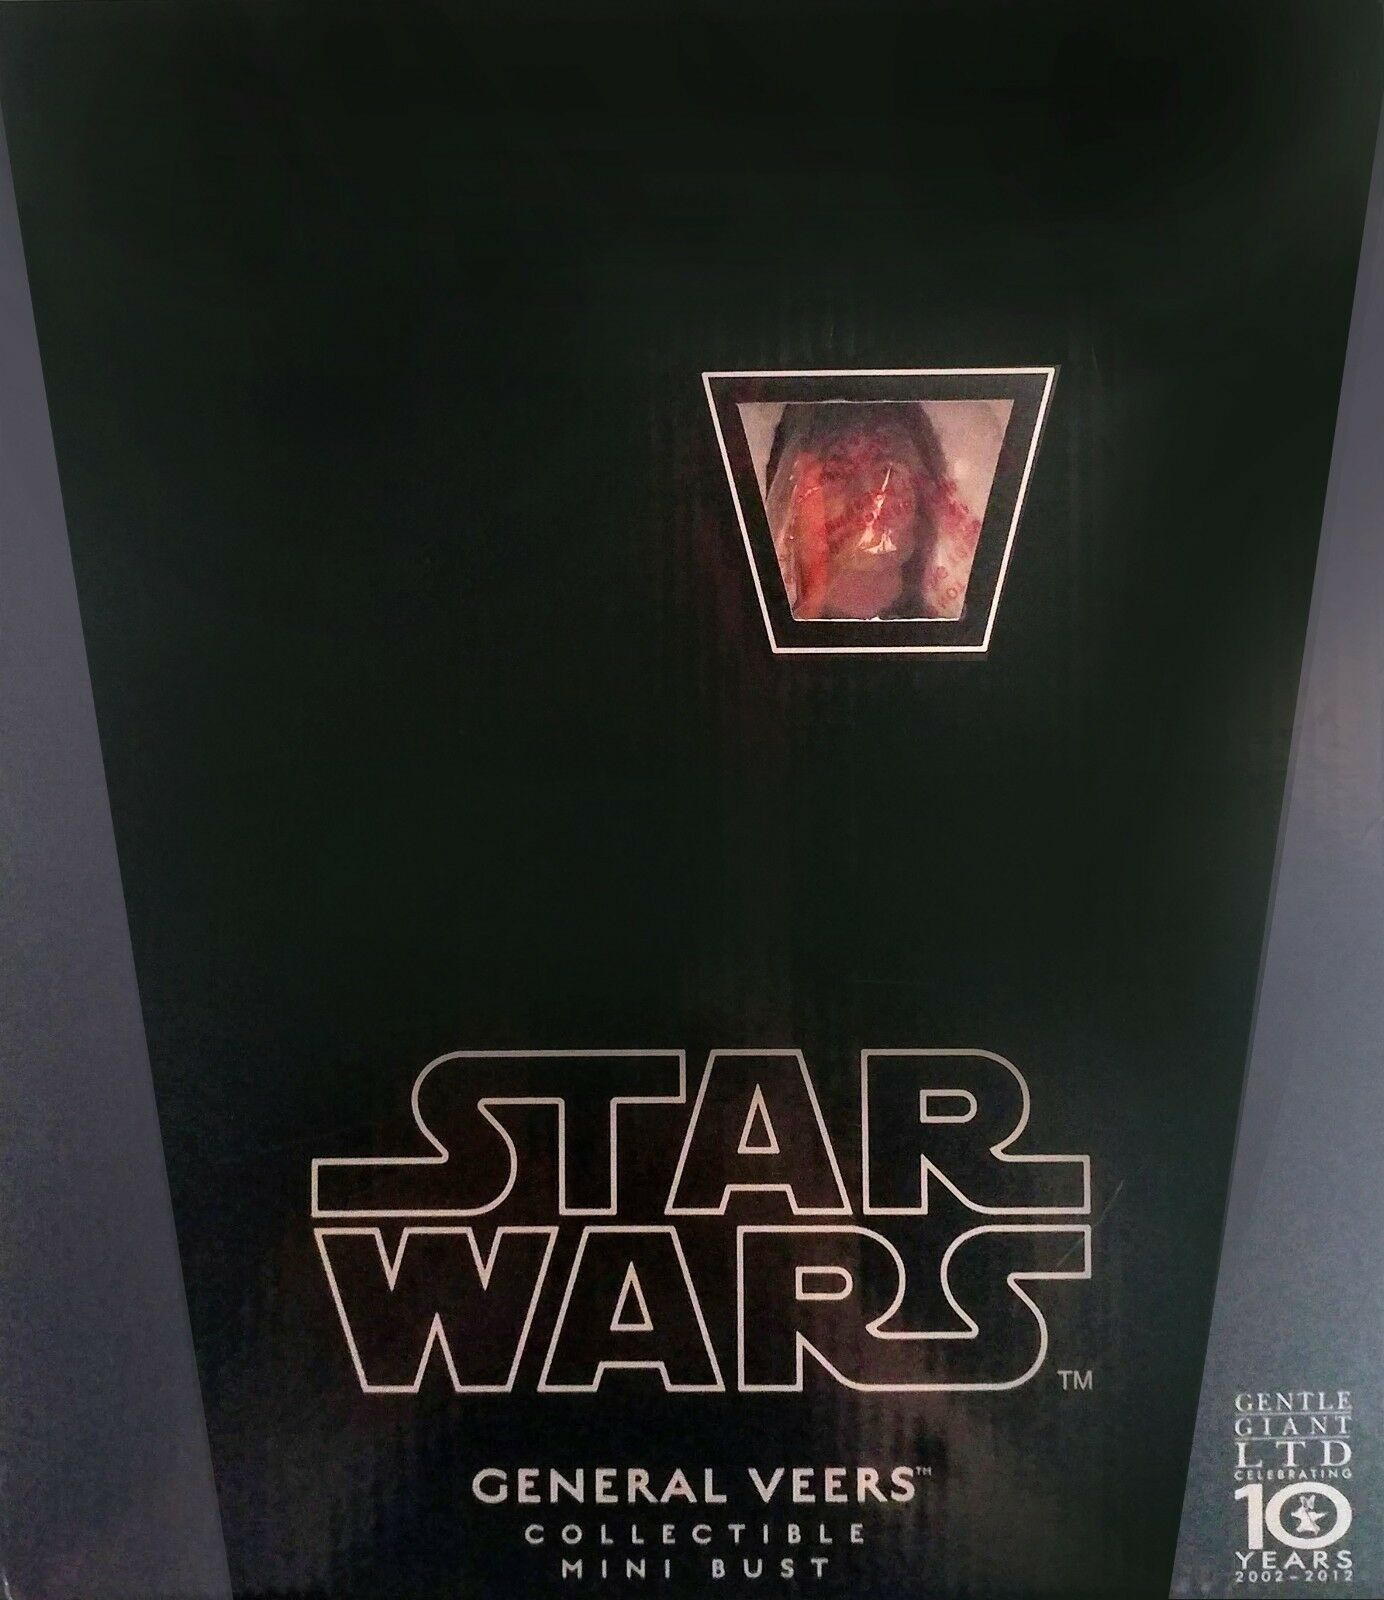 Gentle Giant GENERAL VEERS Mini Bust NIB 342 1200 Star Wars ESB NEW Sideshow